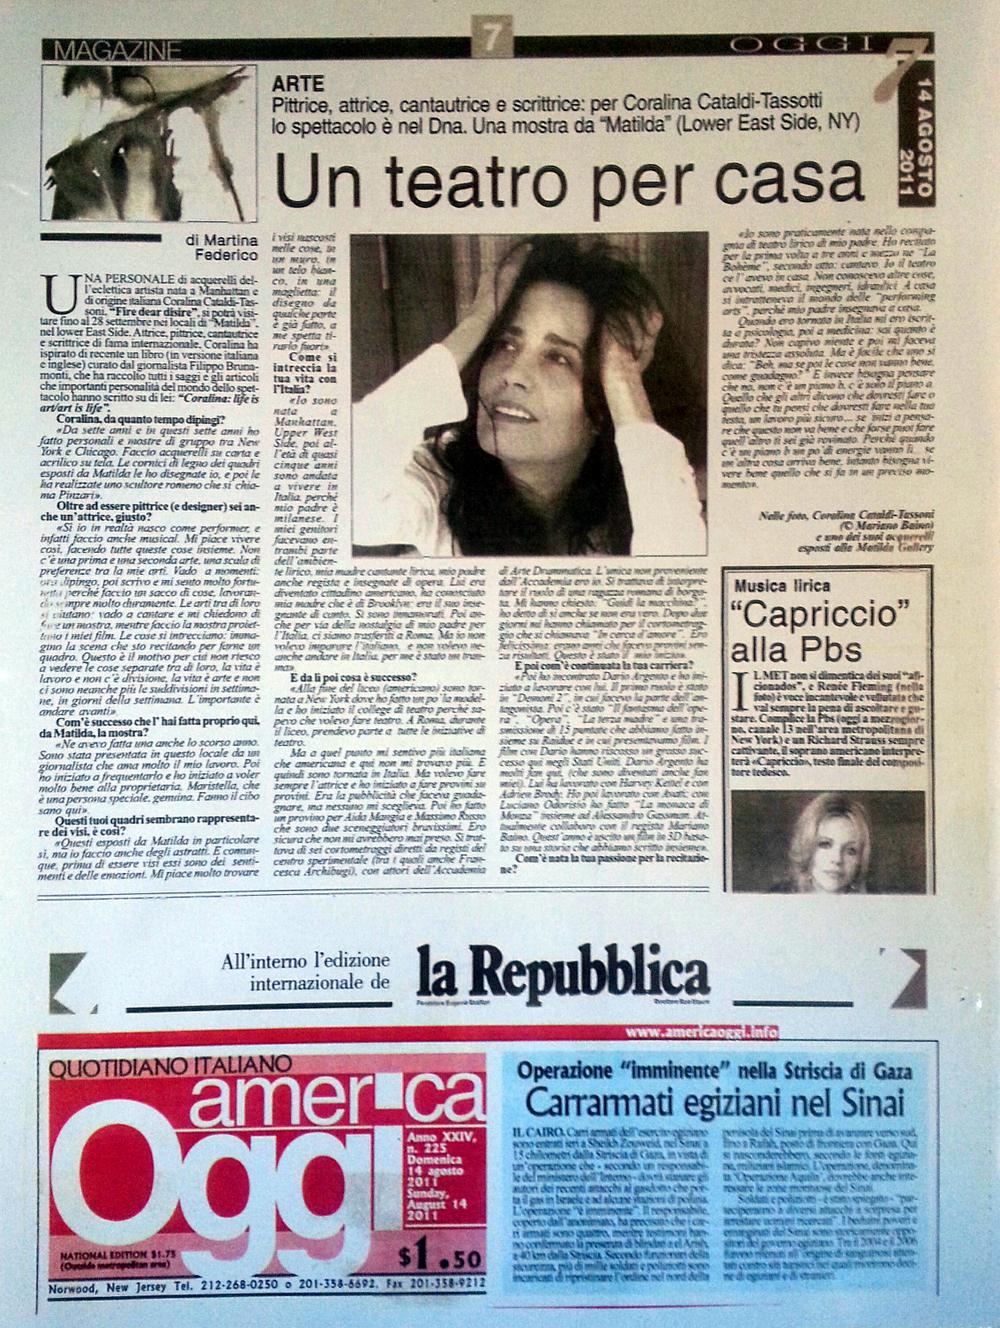 Coralina Cataldi- Tassoni article Un Teatro Per Casa.jpg